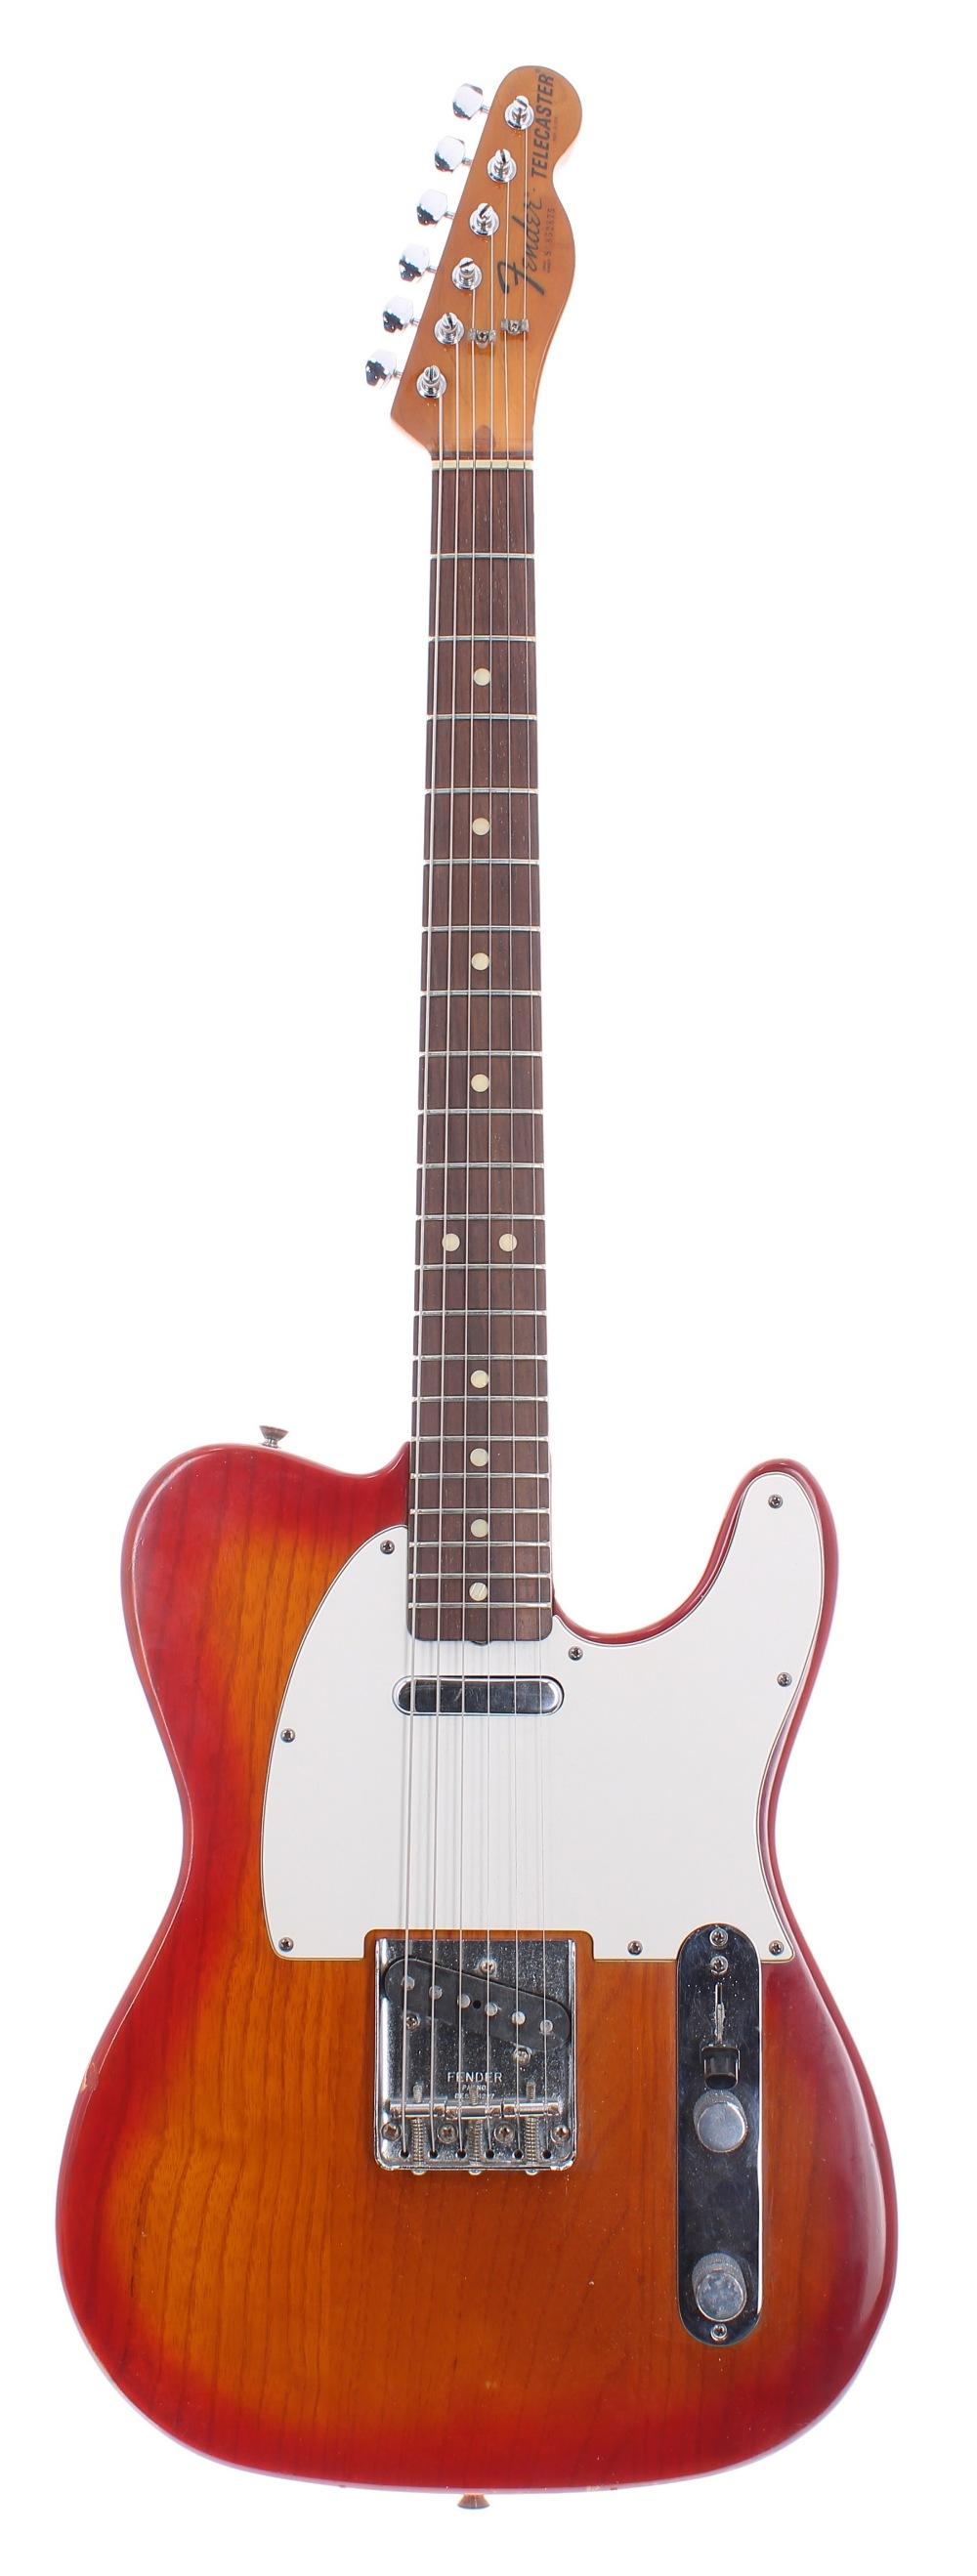 1981 Fender Telecaster electric guitar, made in USA, ser. no. S8xxx5; Finish: sienna sunburst,